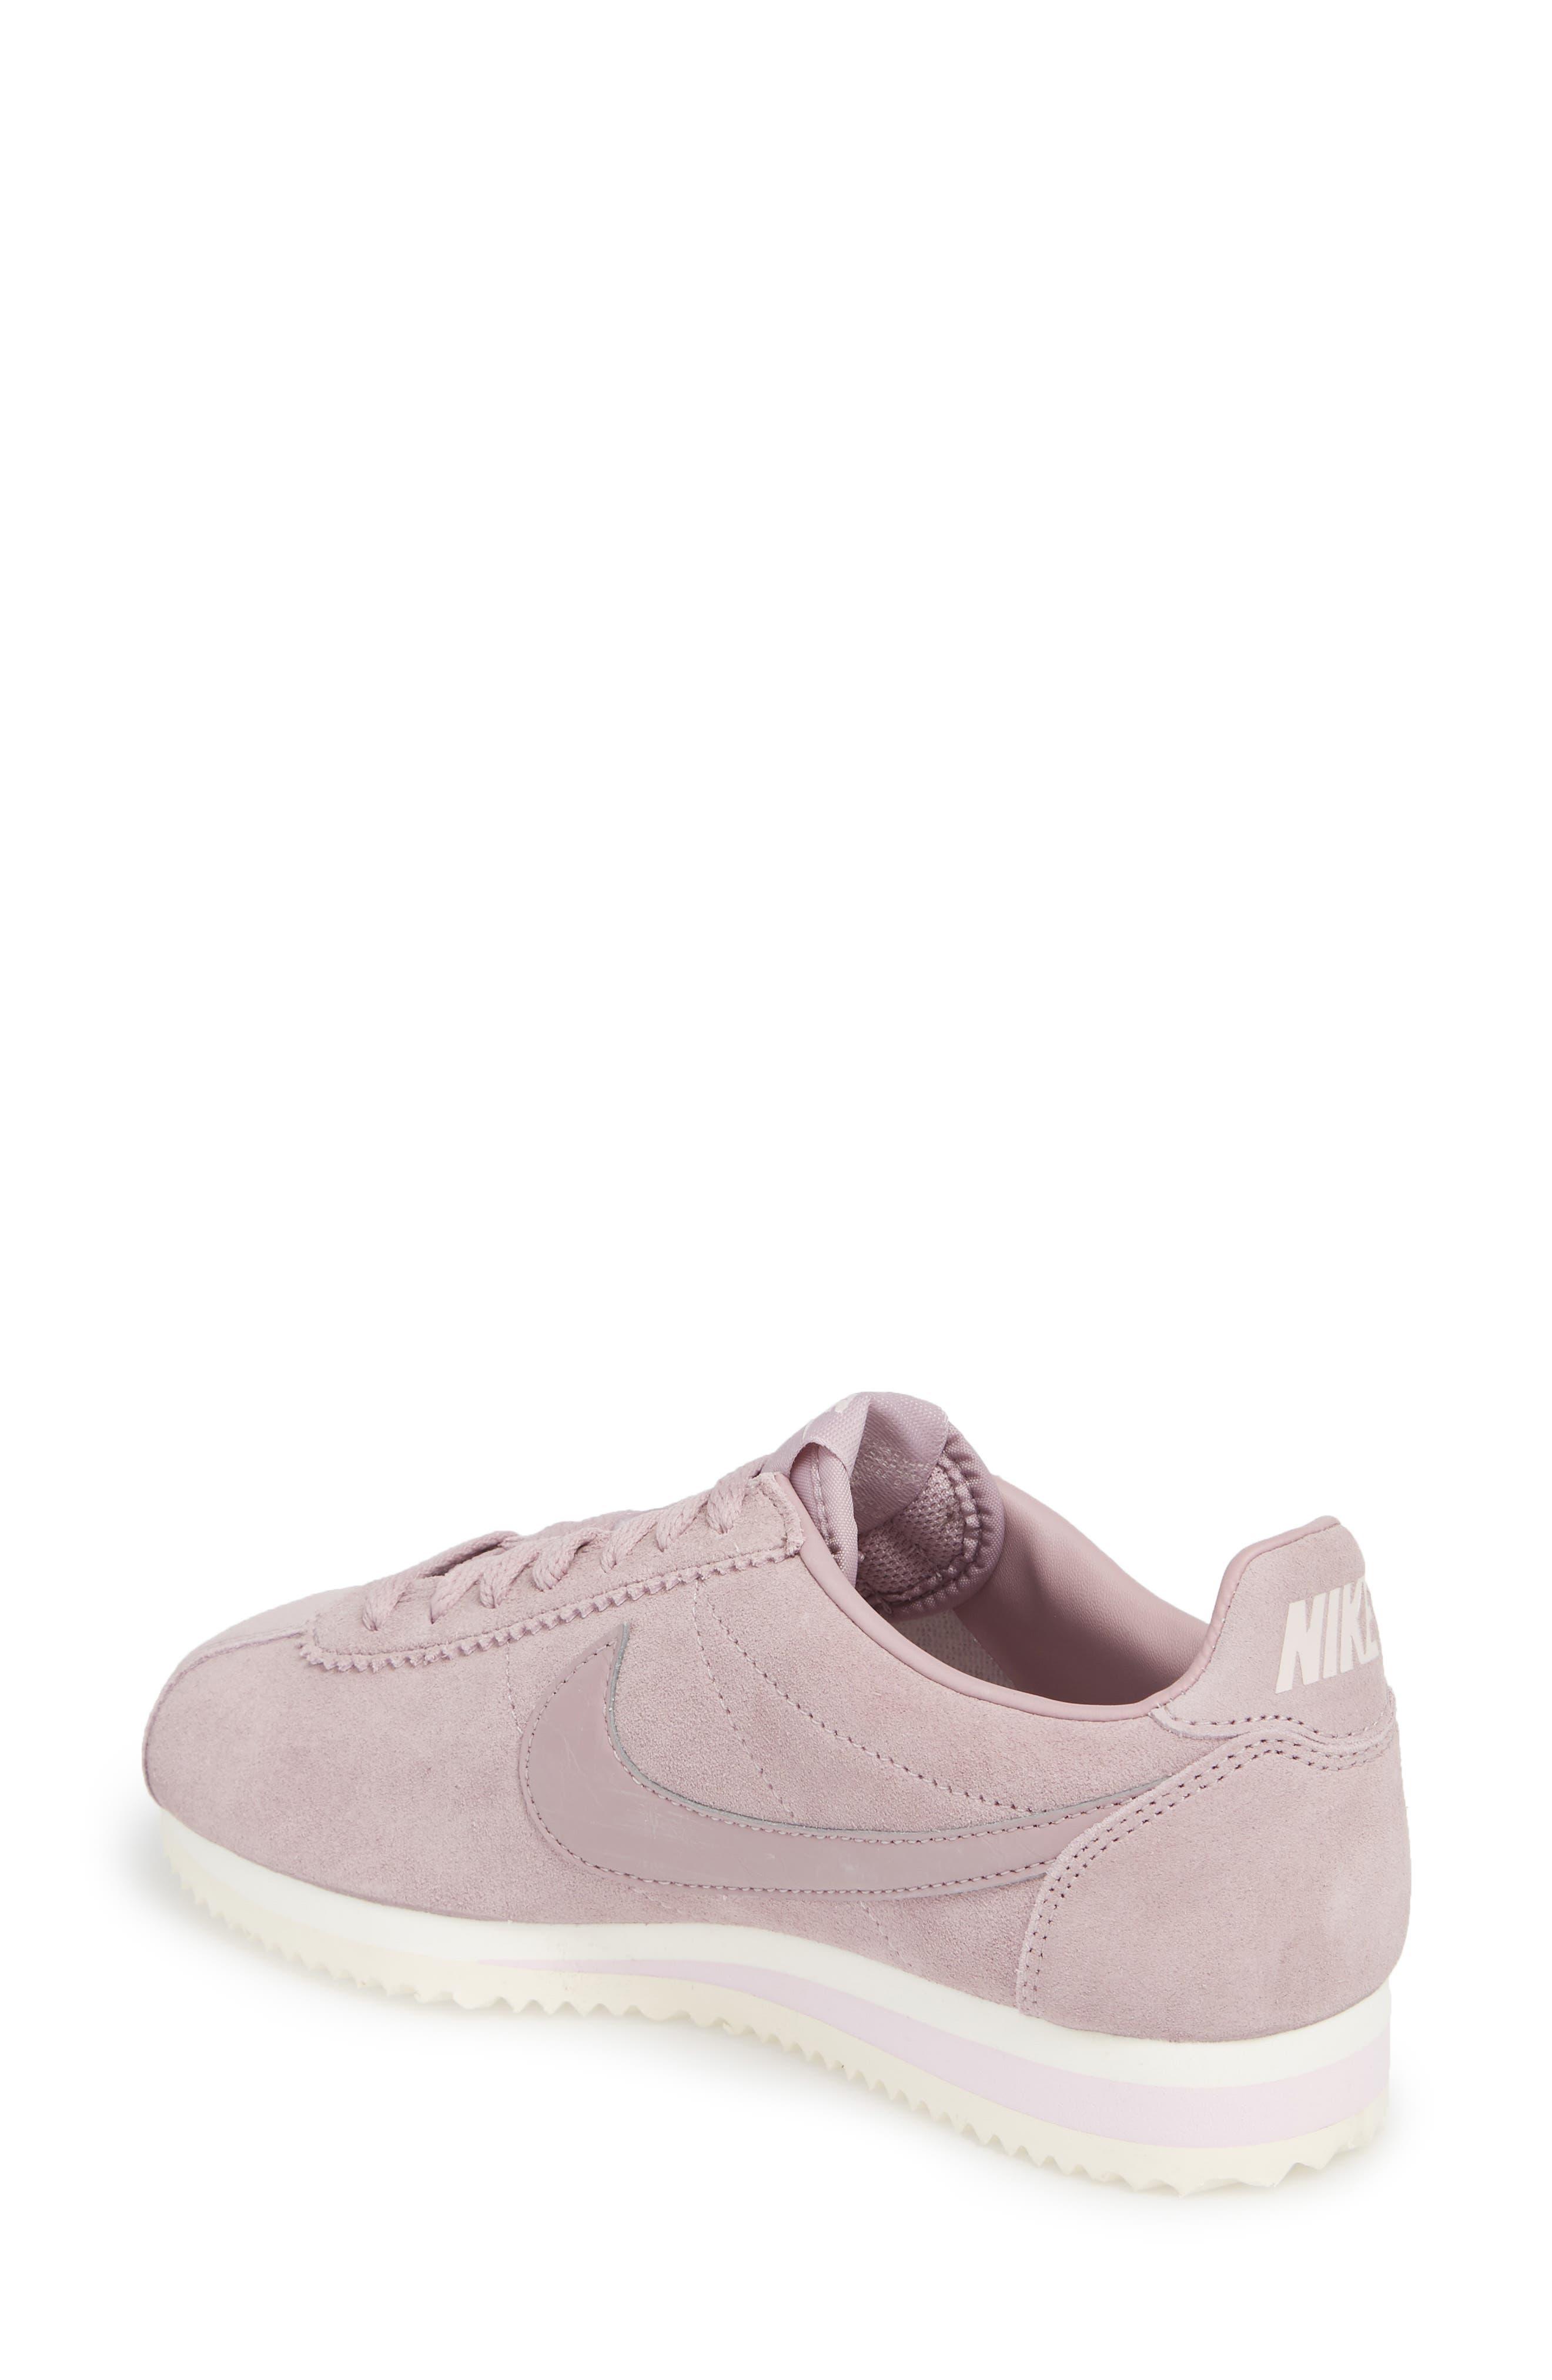 Classic Cortez Suede Sneaker,                             Alternate thumbnail 2, color,                             Elemental Rose/ Elemental Rose